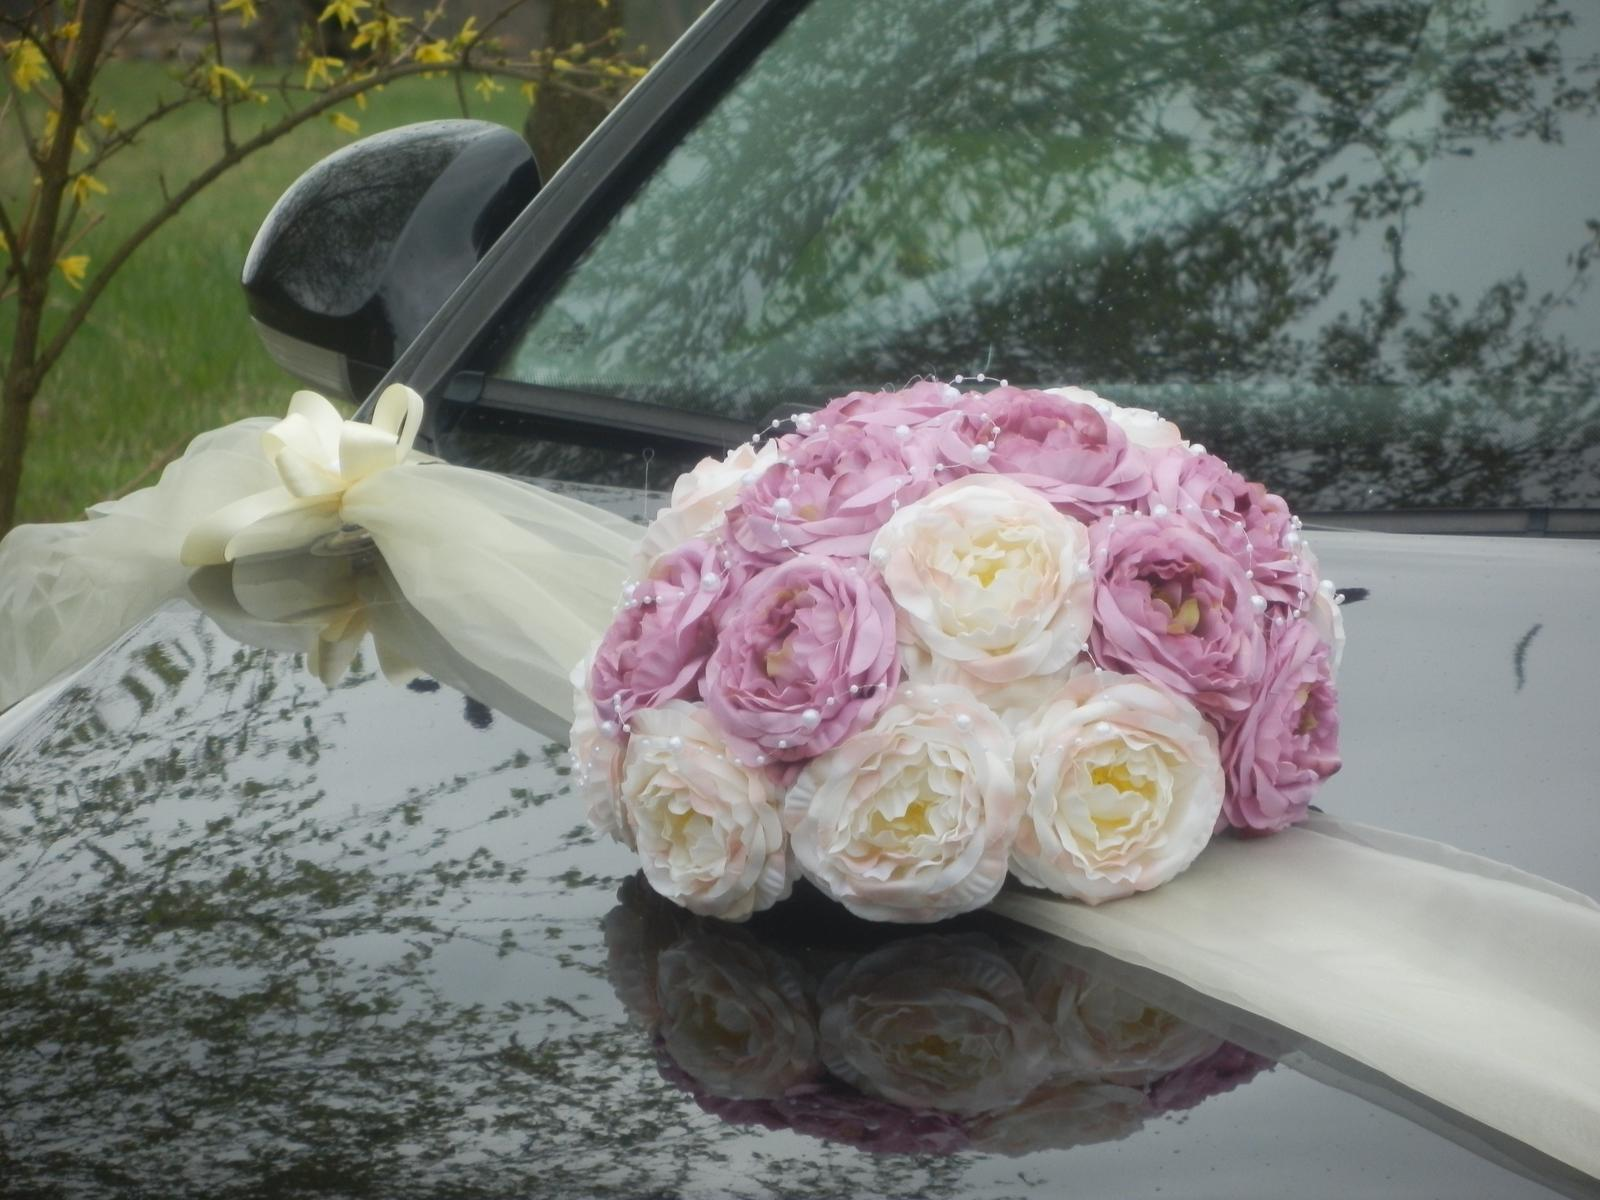 Svatebni Dekorace Vyzdoba Na Auto Trs Buket 490 Kc Svatebni